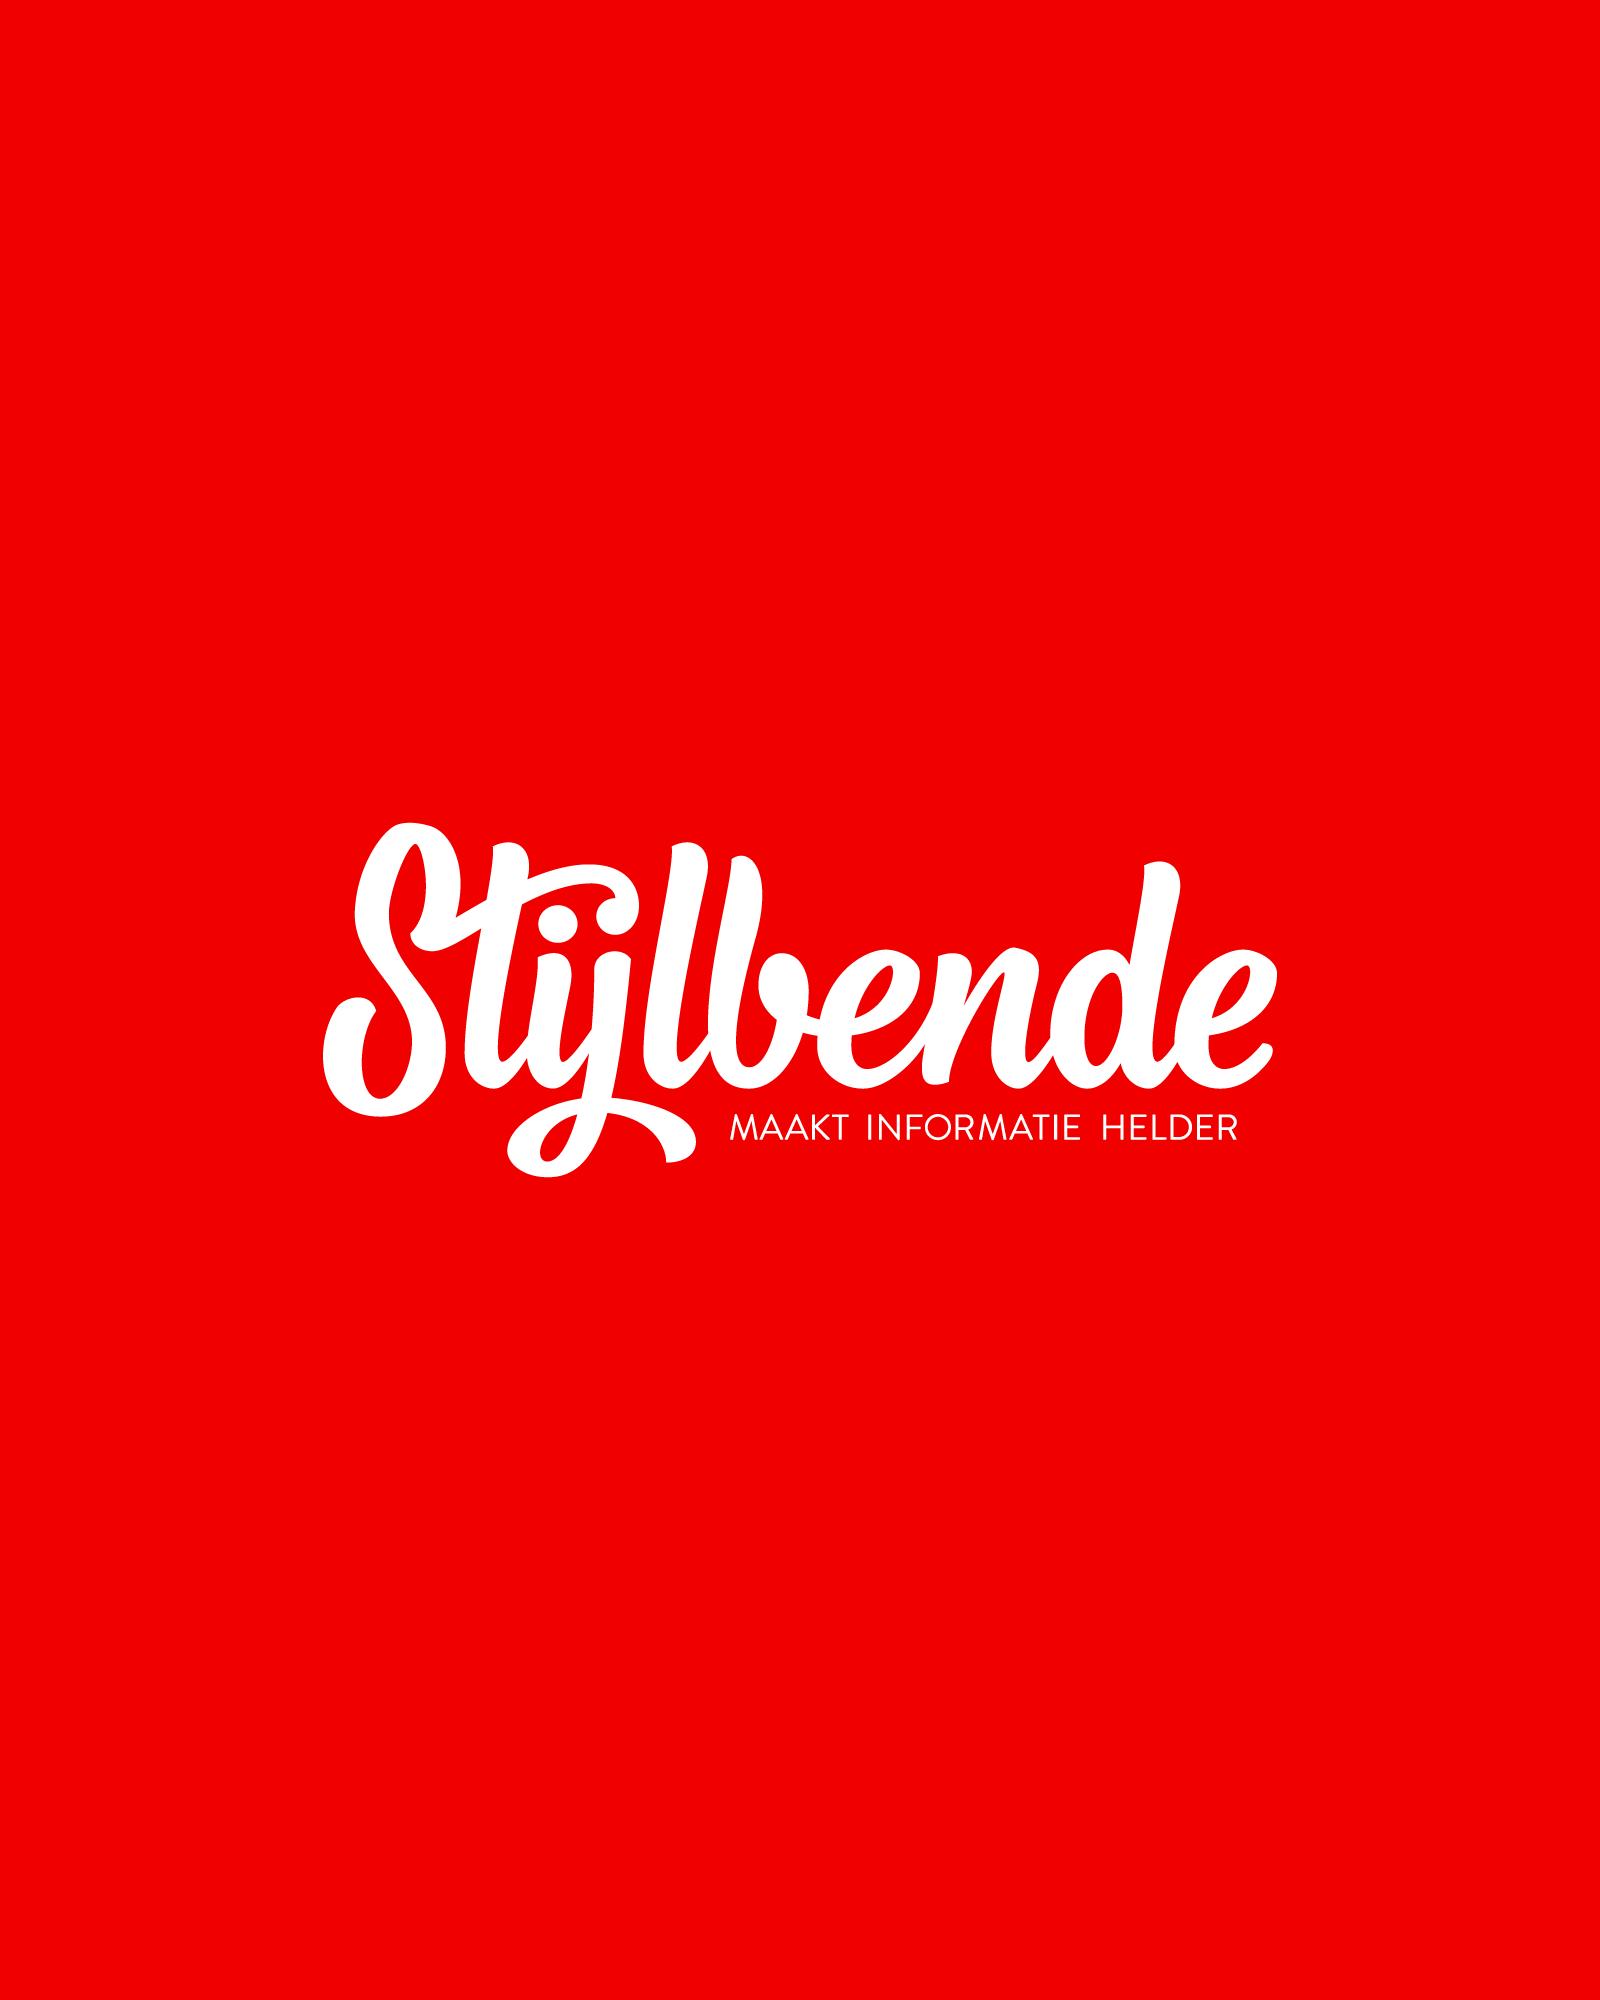 Logo Refresh    Stijlbende    View Project